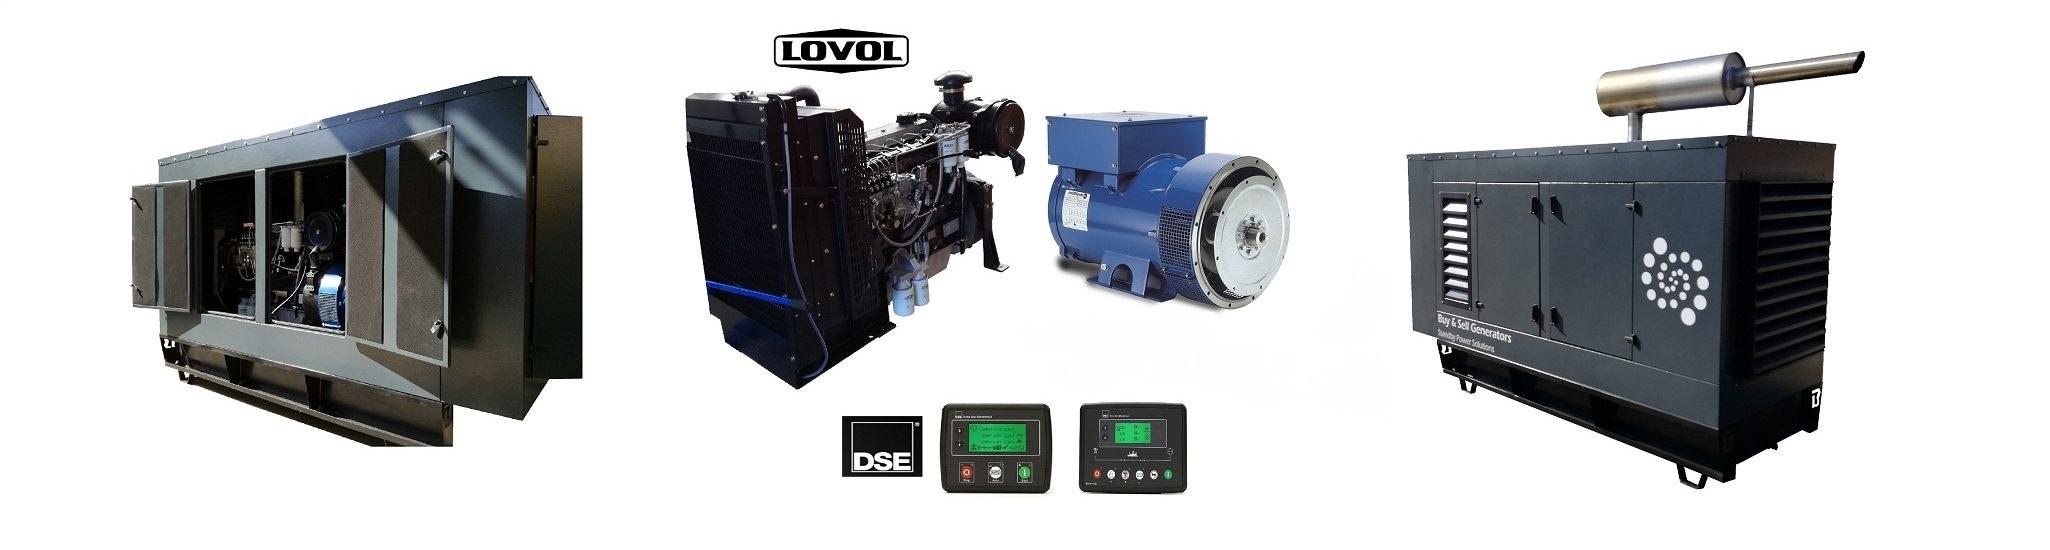 LOVOL-DIESEL-GENERATOR-BANNER-NEW-RESIZED-2100x550